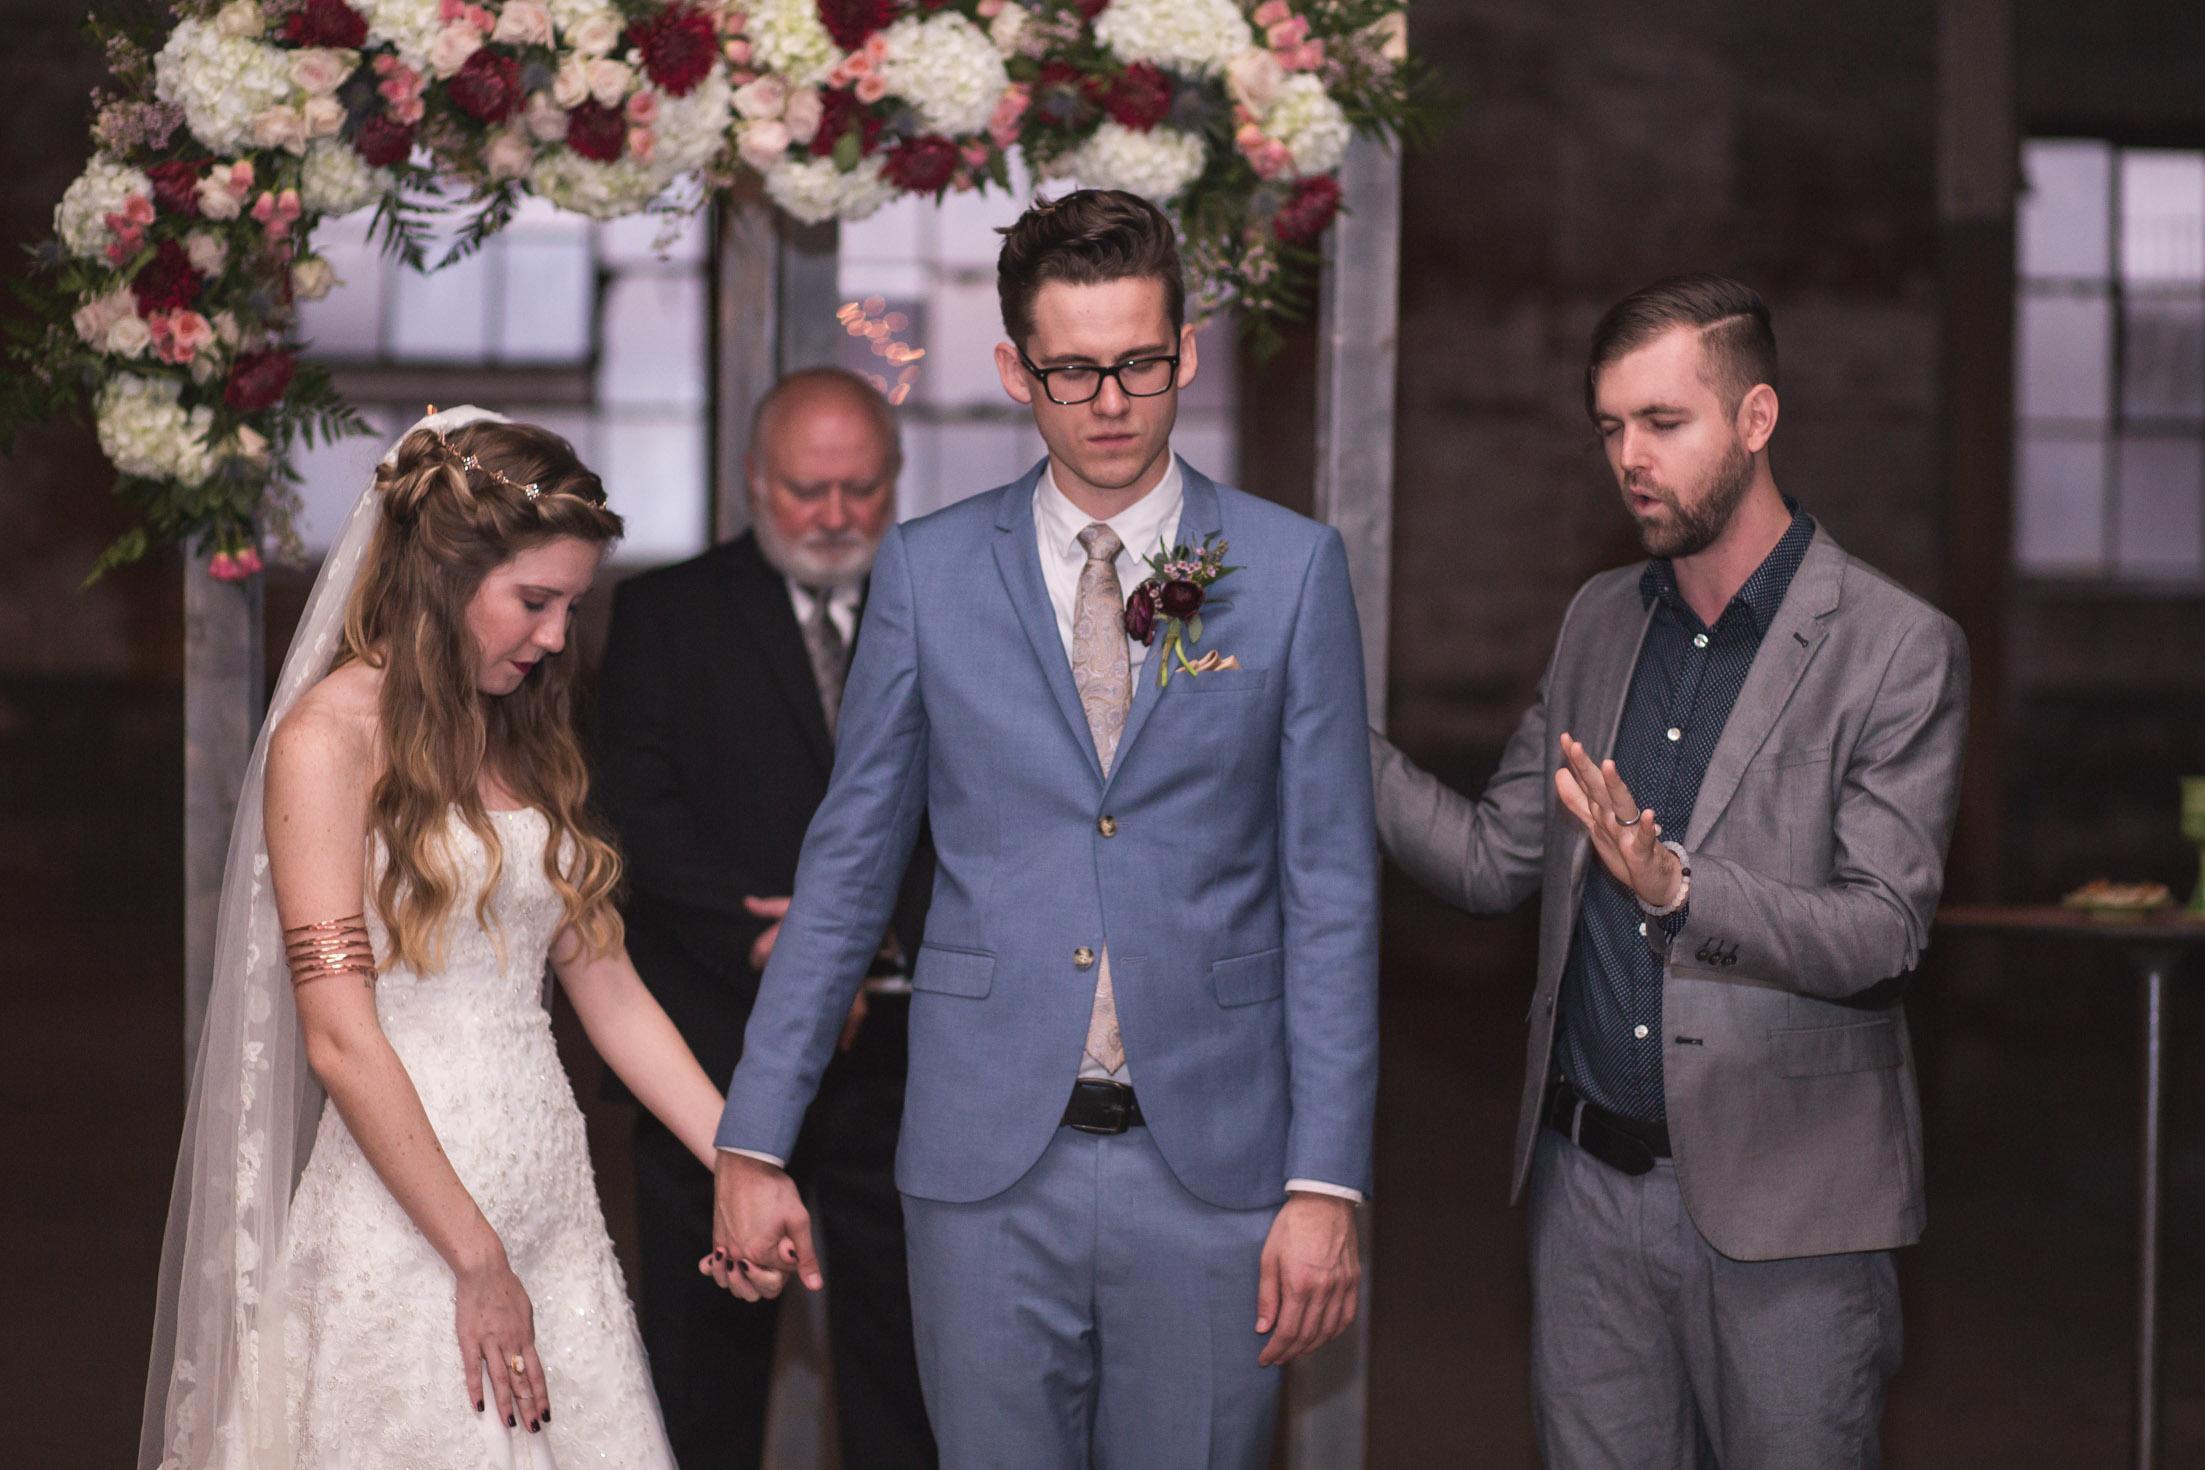 Adam-Szrmack-The-Glass-Factory-Wedding-112.jpg